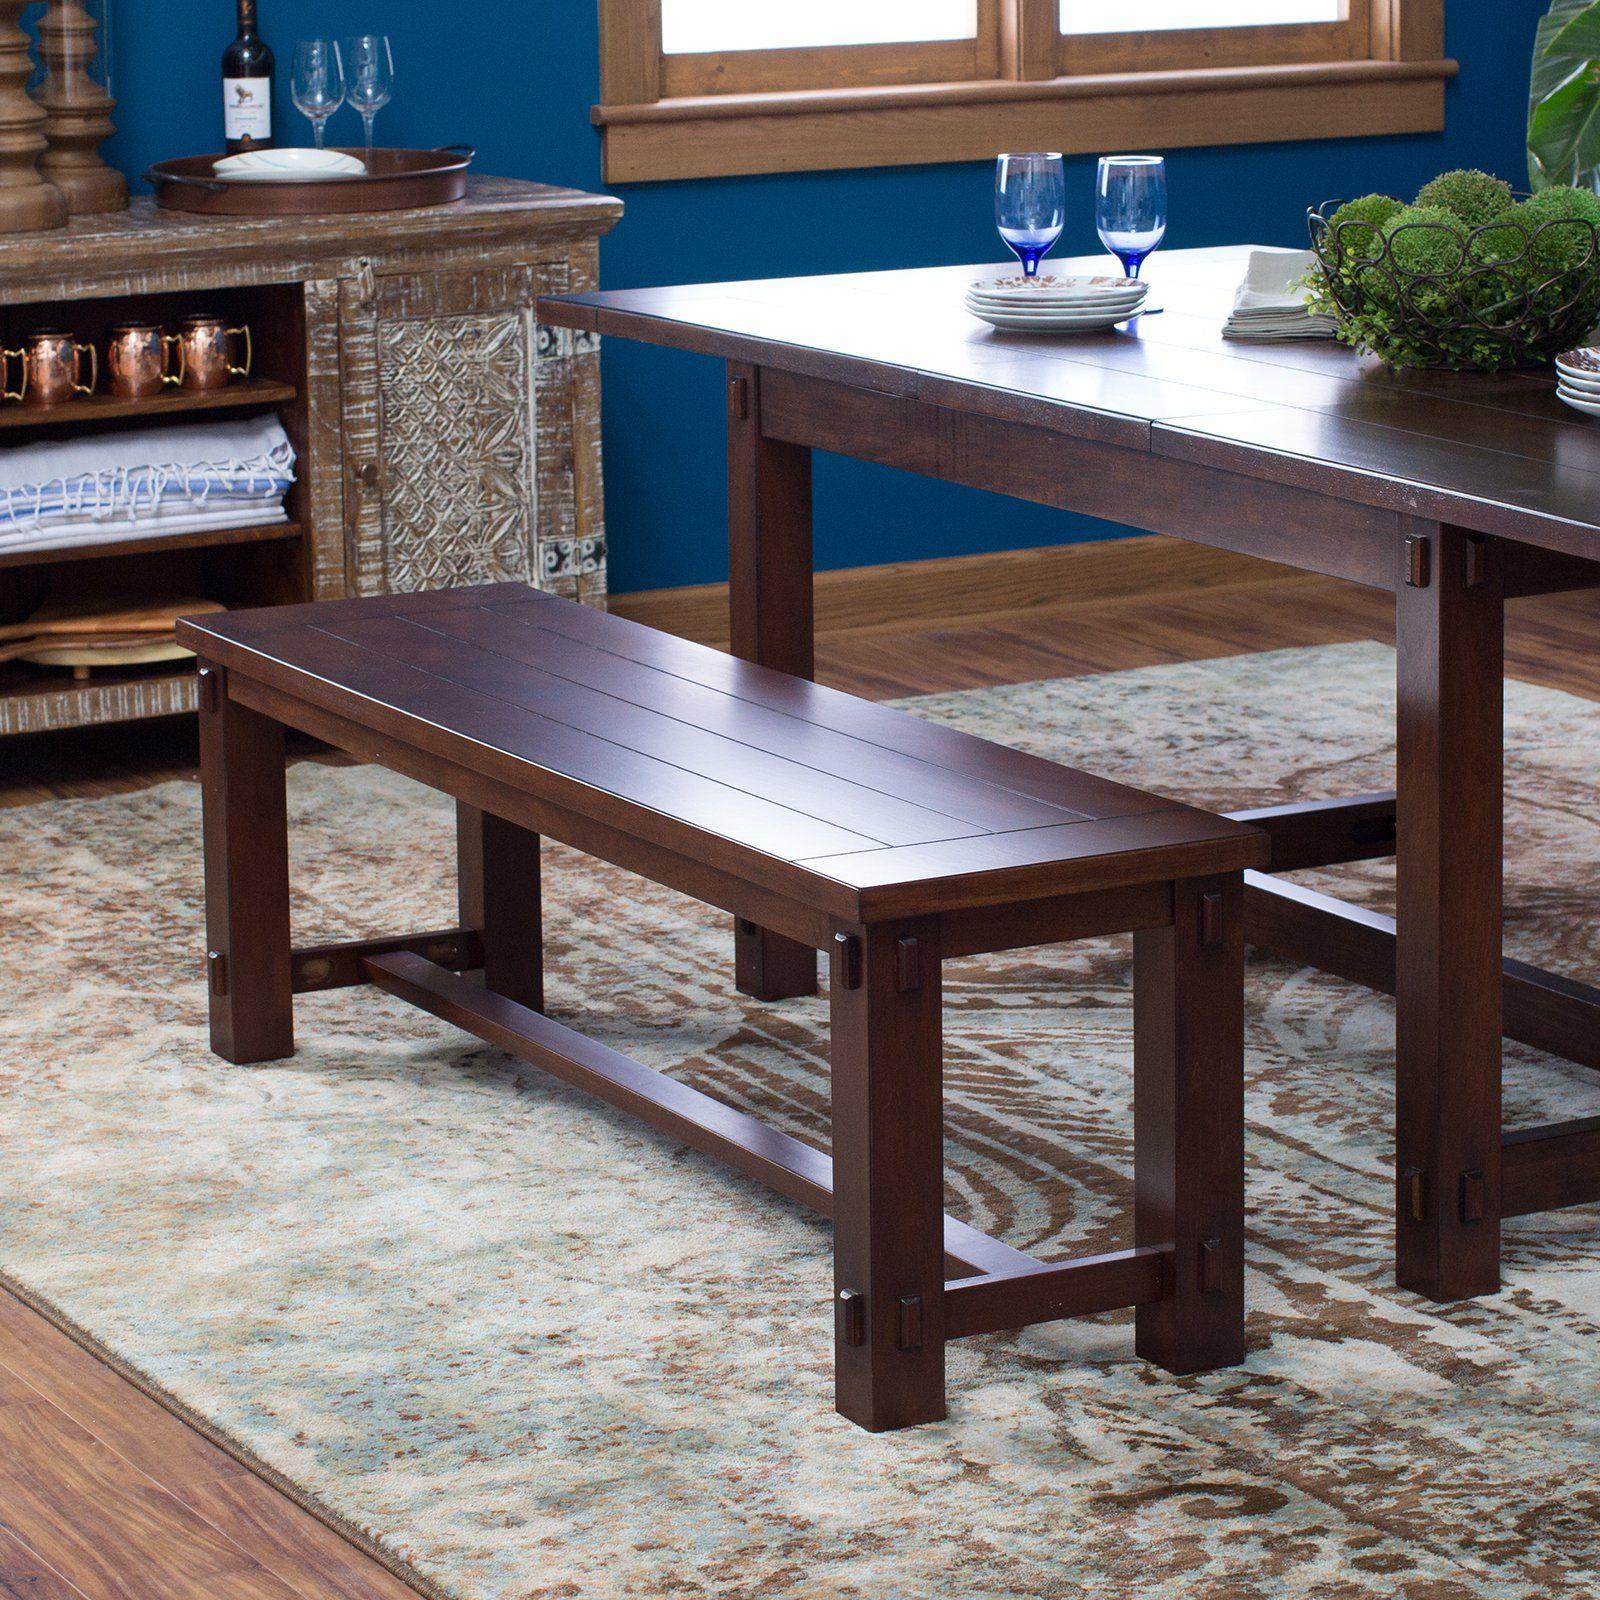 Surprising Belham Living Bartlett Dining Bench From Hayneedle Com Dailytribune Chair Design For Home Dailytribuneorg